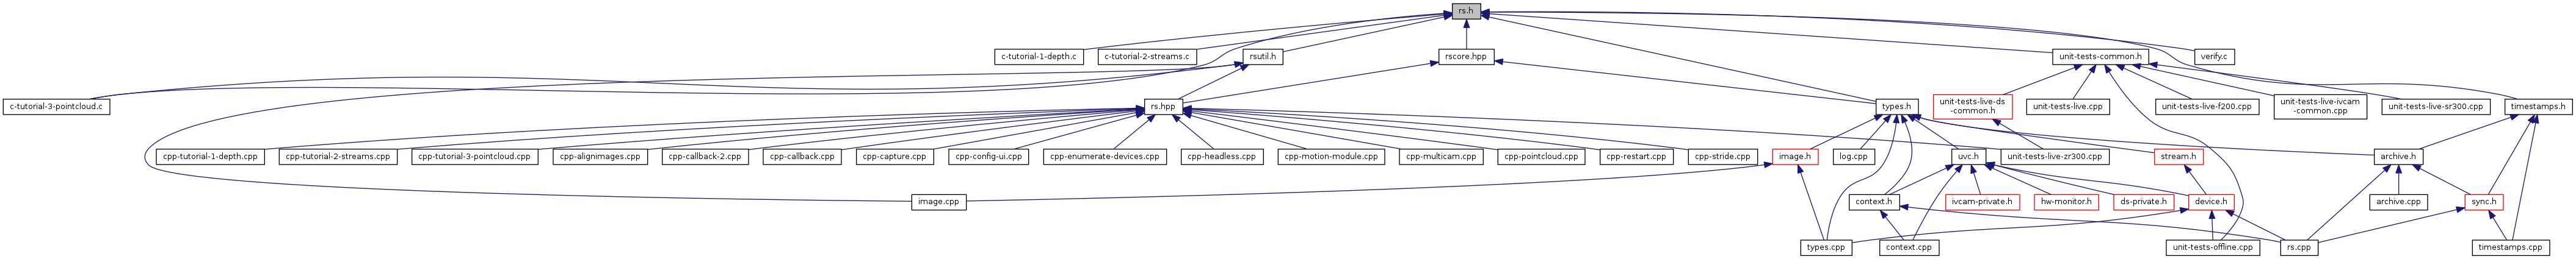 librealsense: rs h File Reference